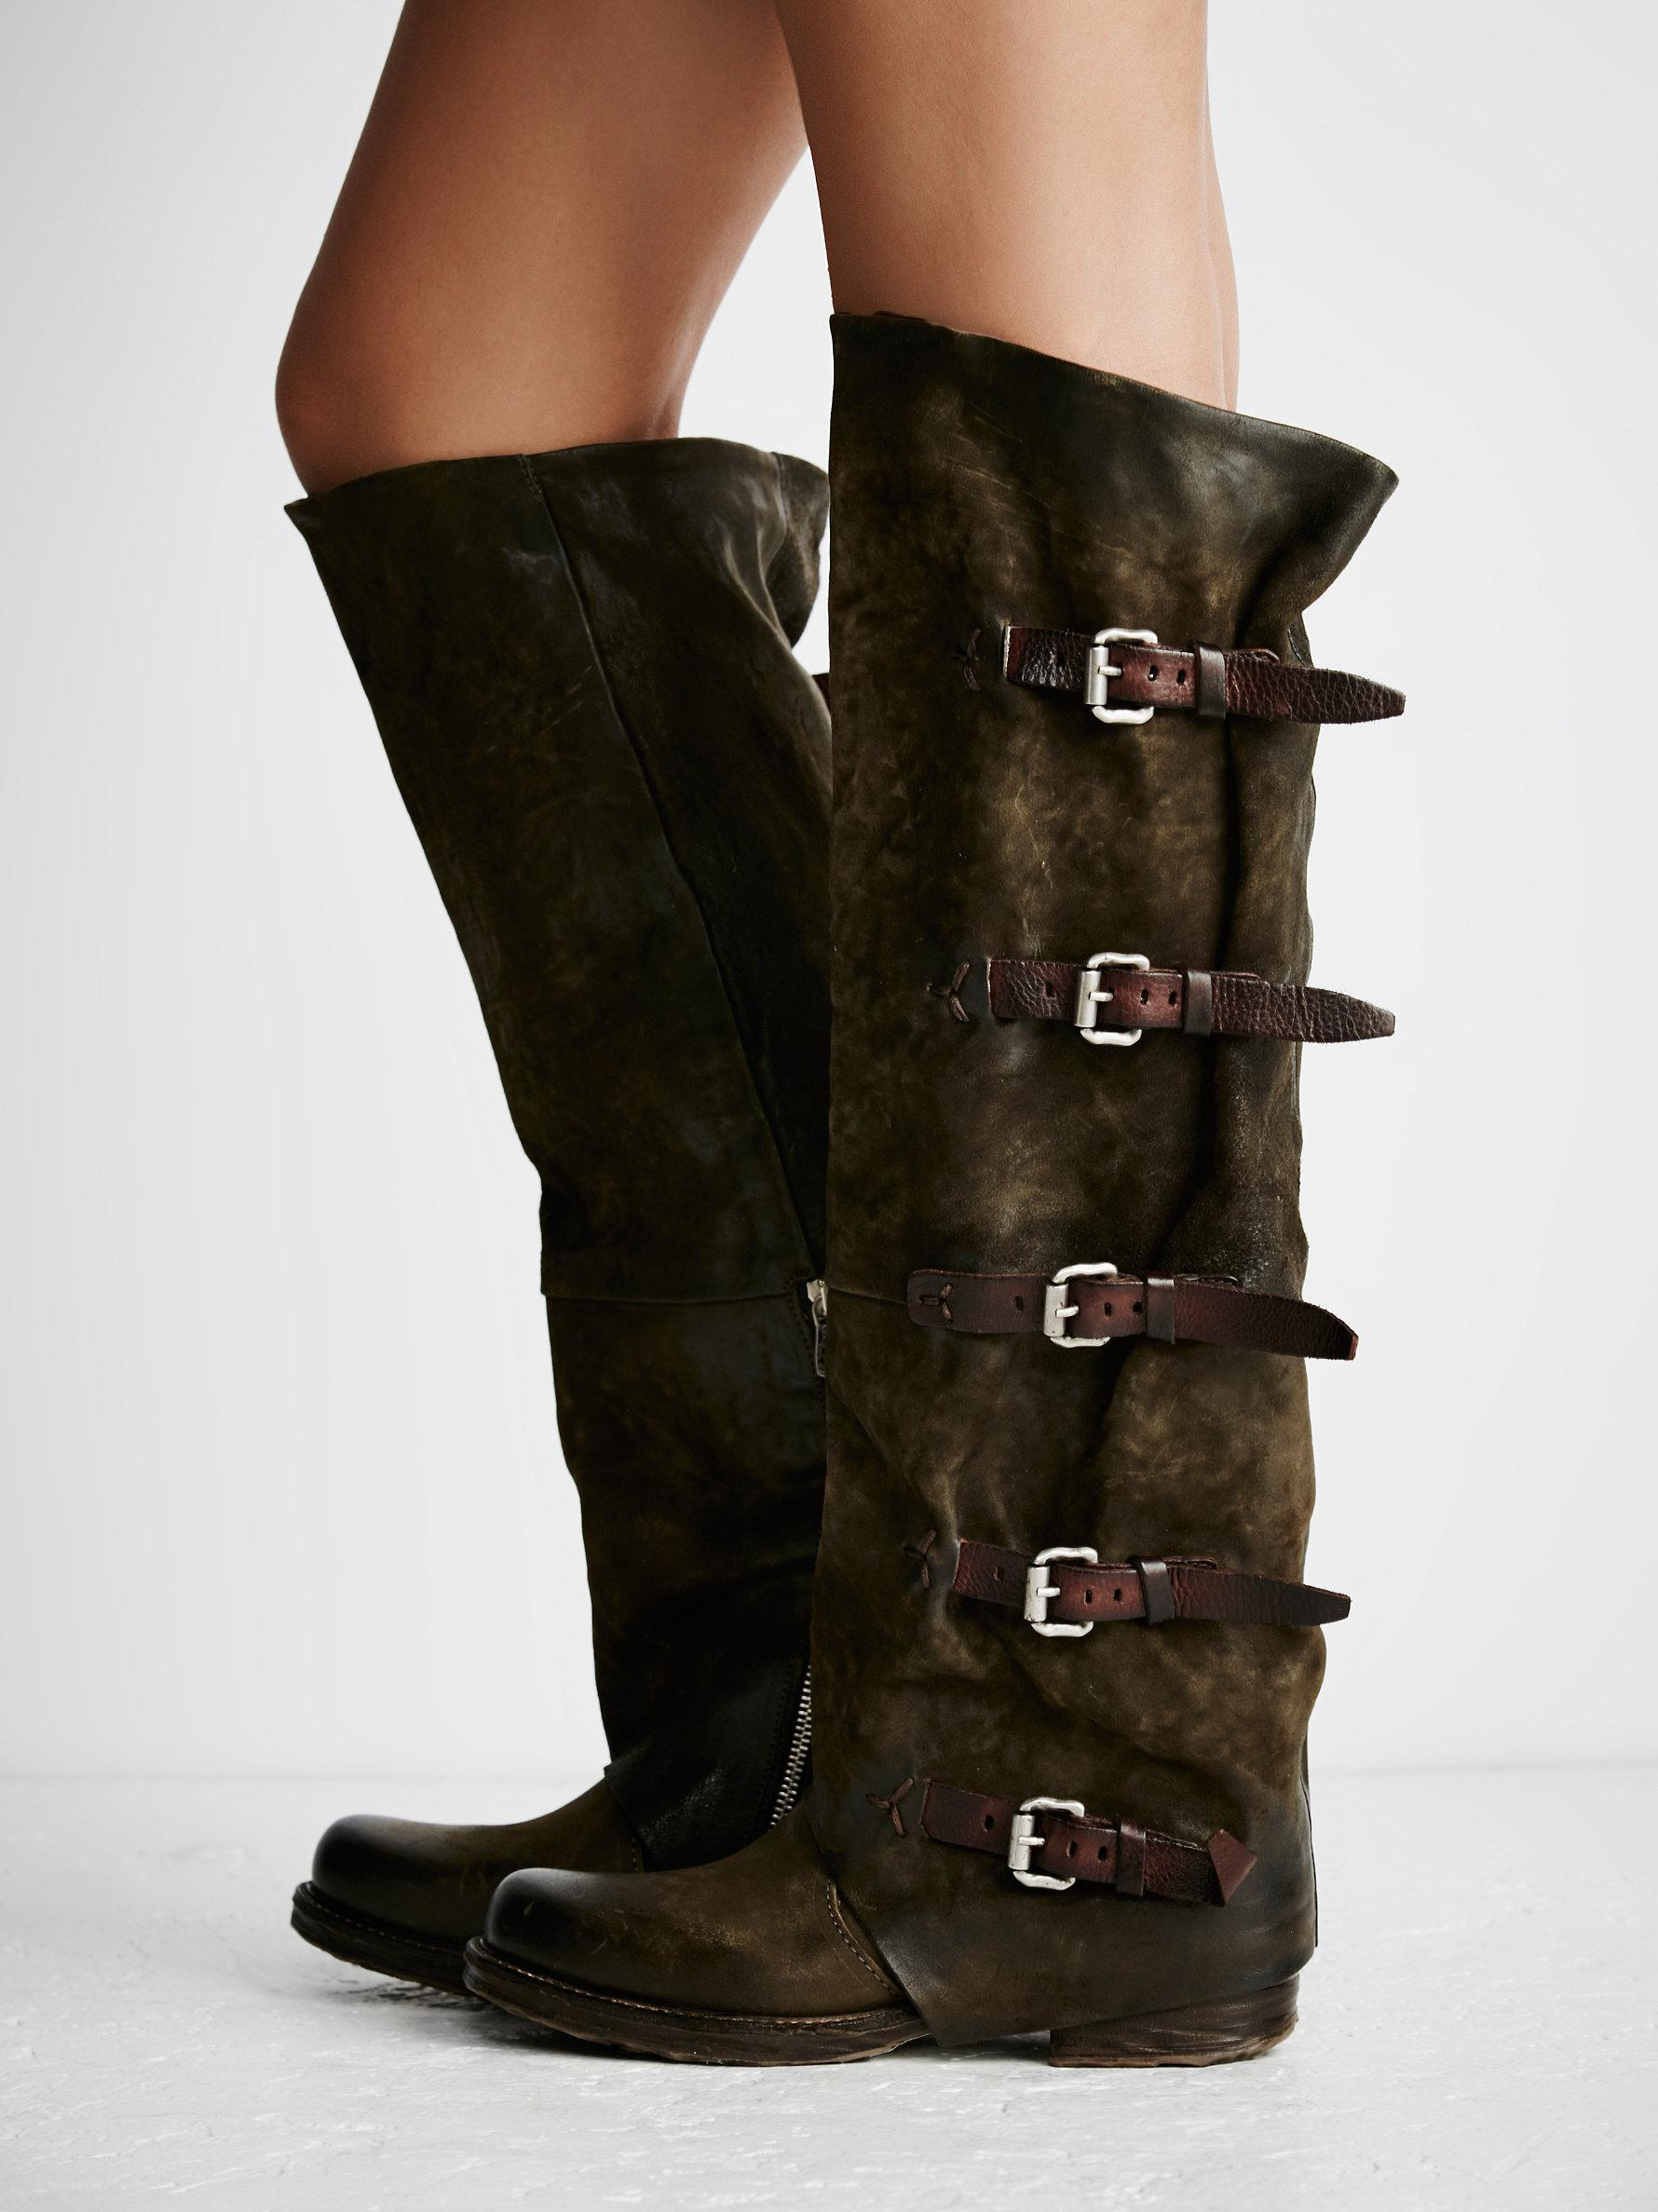 Free People Leather Tatum Over The Knee Boot